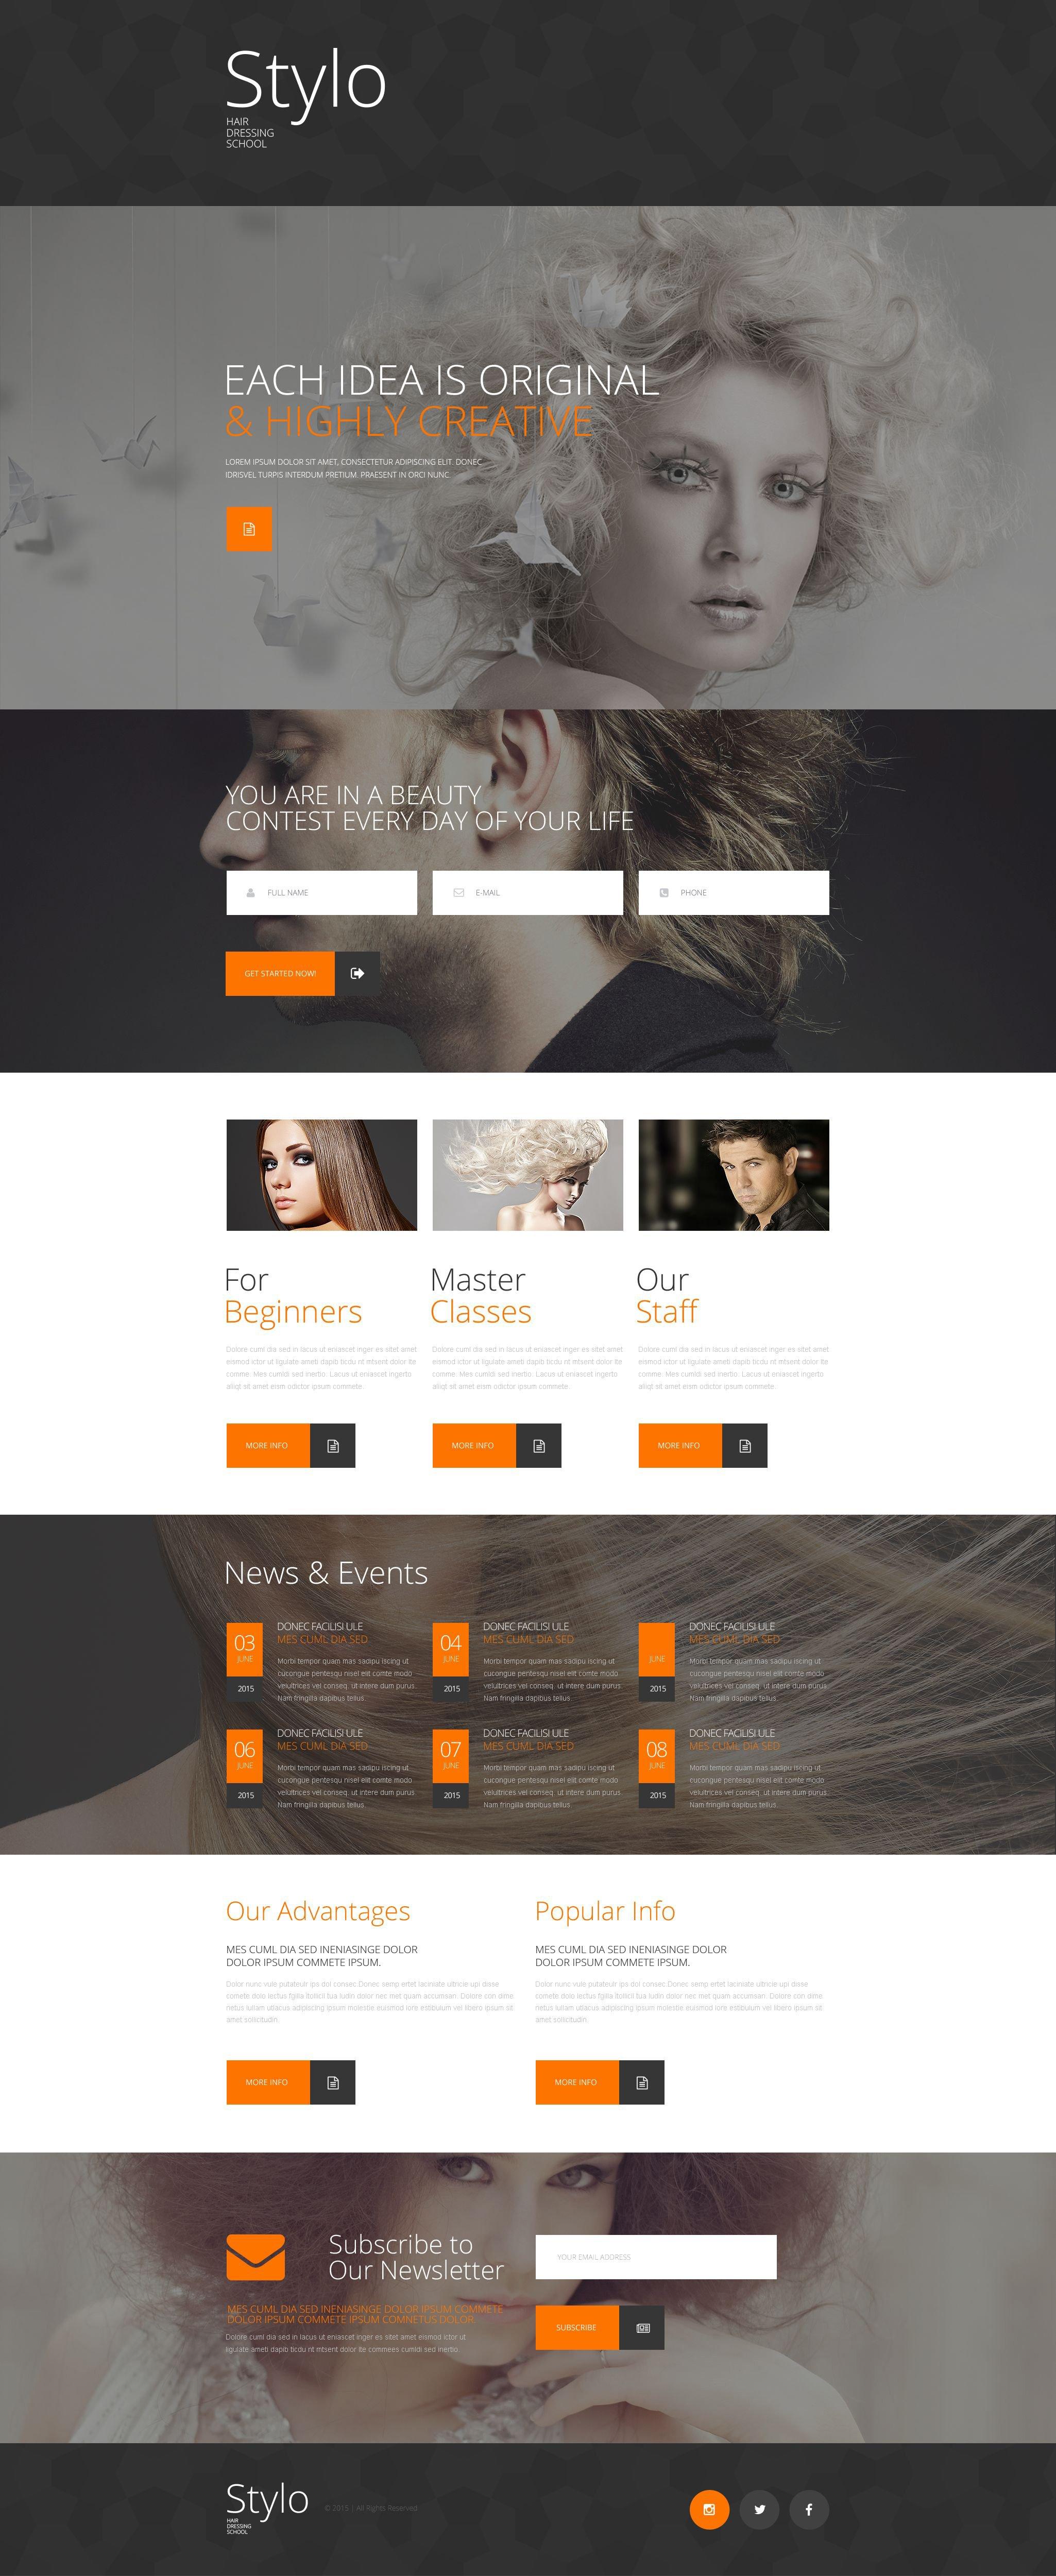 Beauty School Responsive Landing Page Template - screenshot